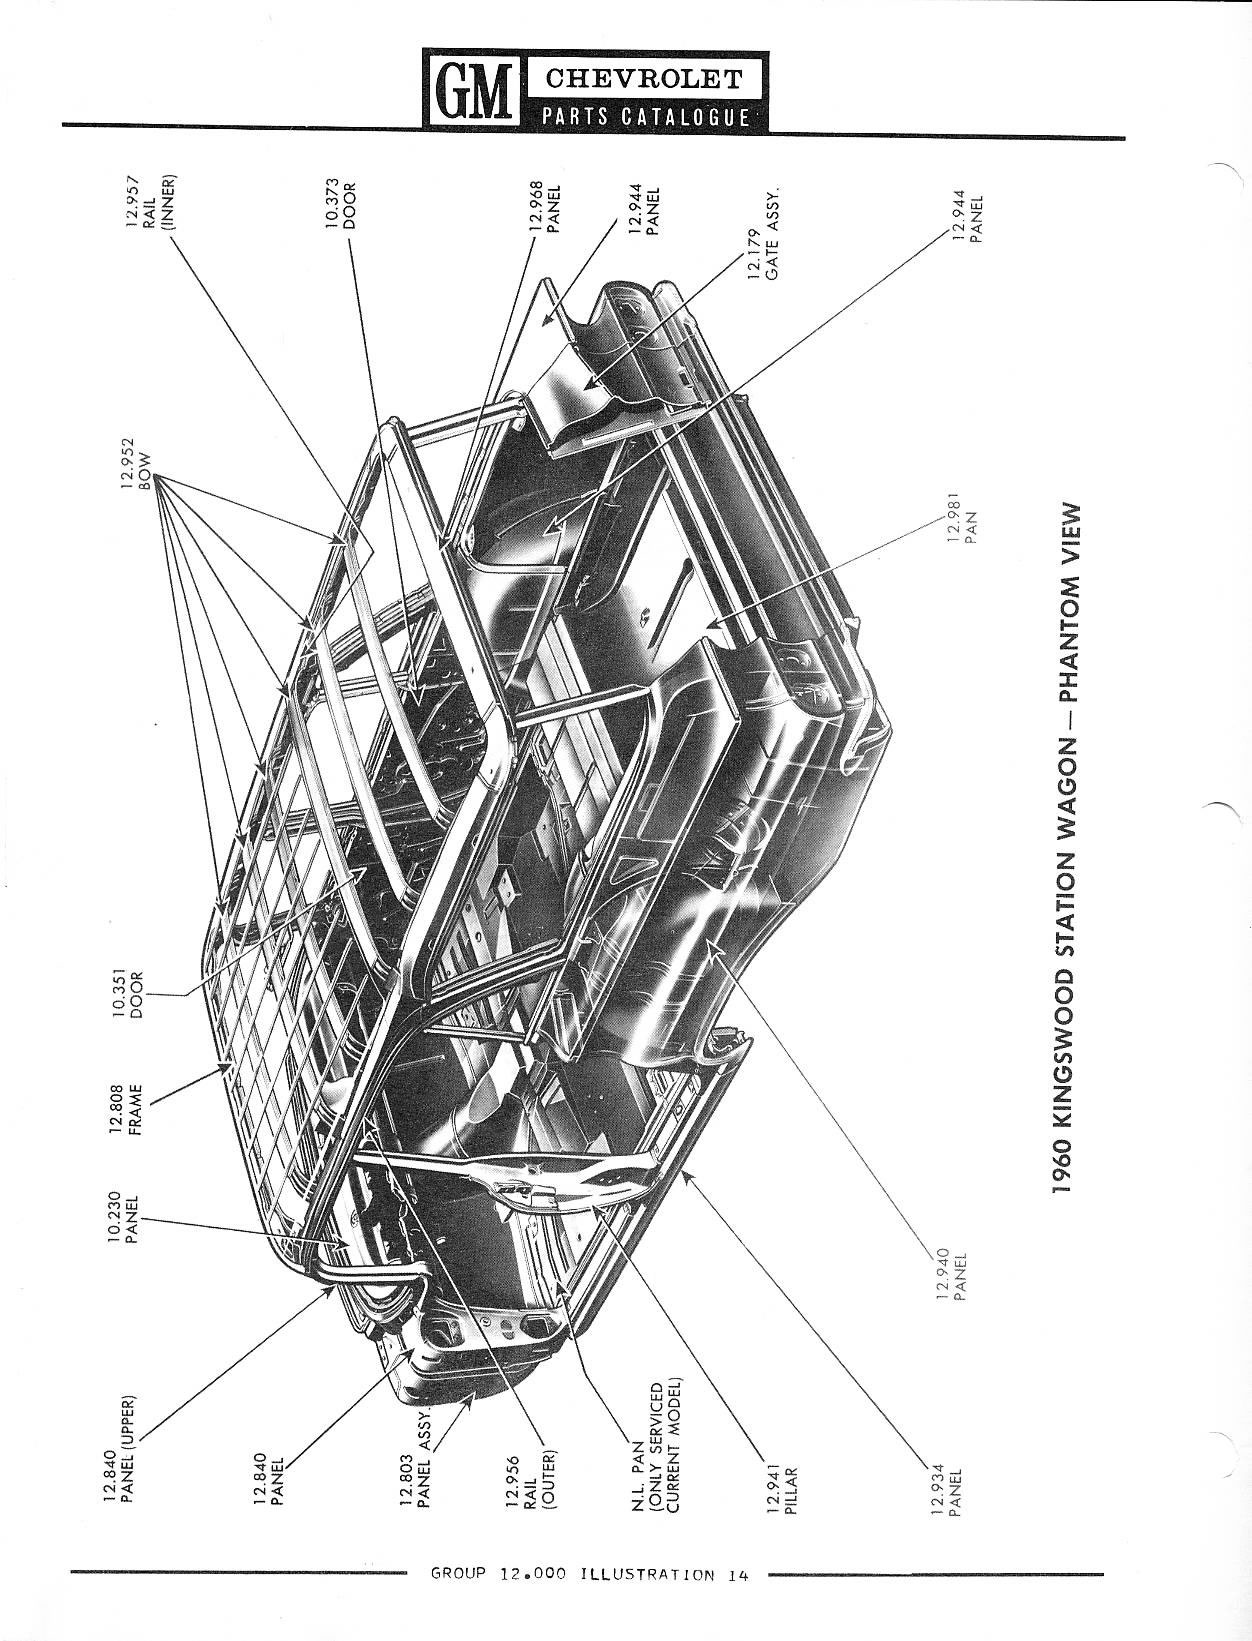 1958-1968 Chevrolet Parts Catalog / Image170.jpg